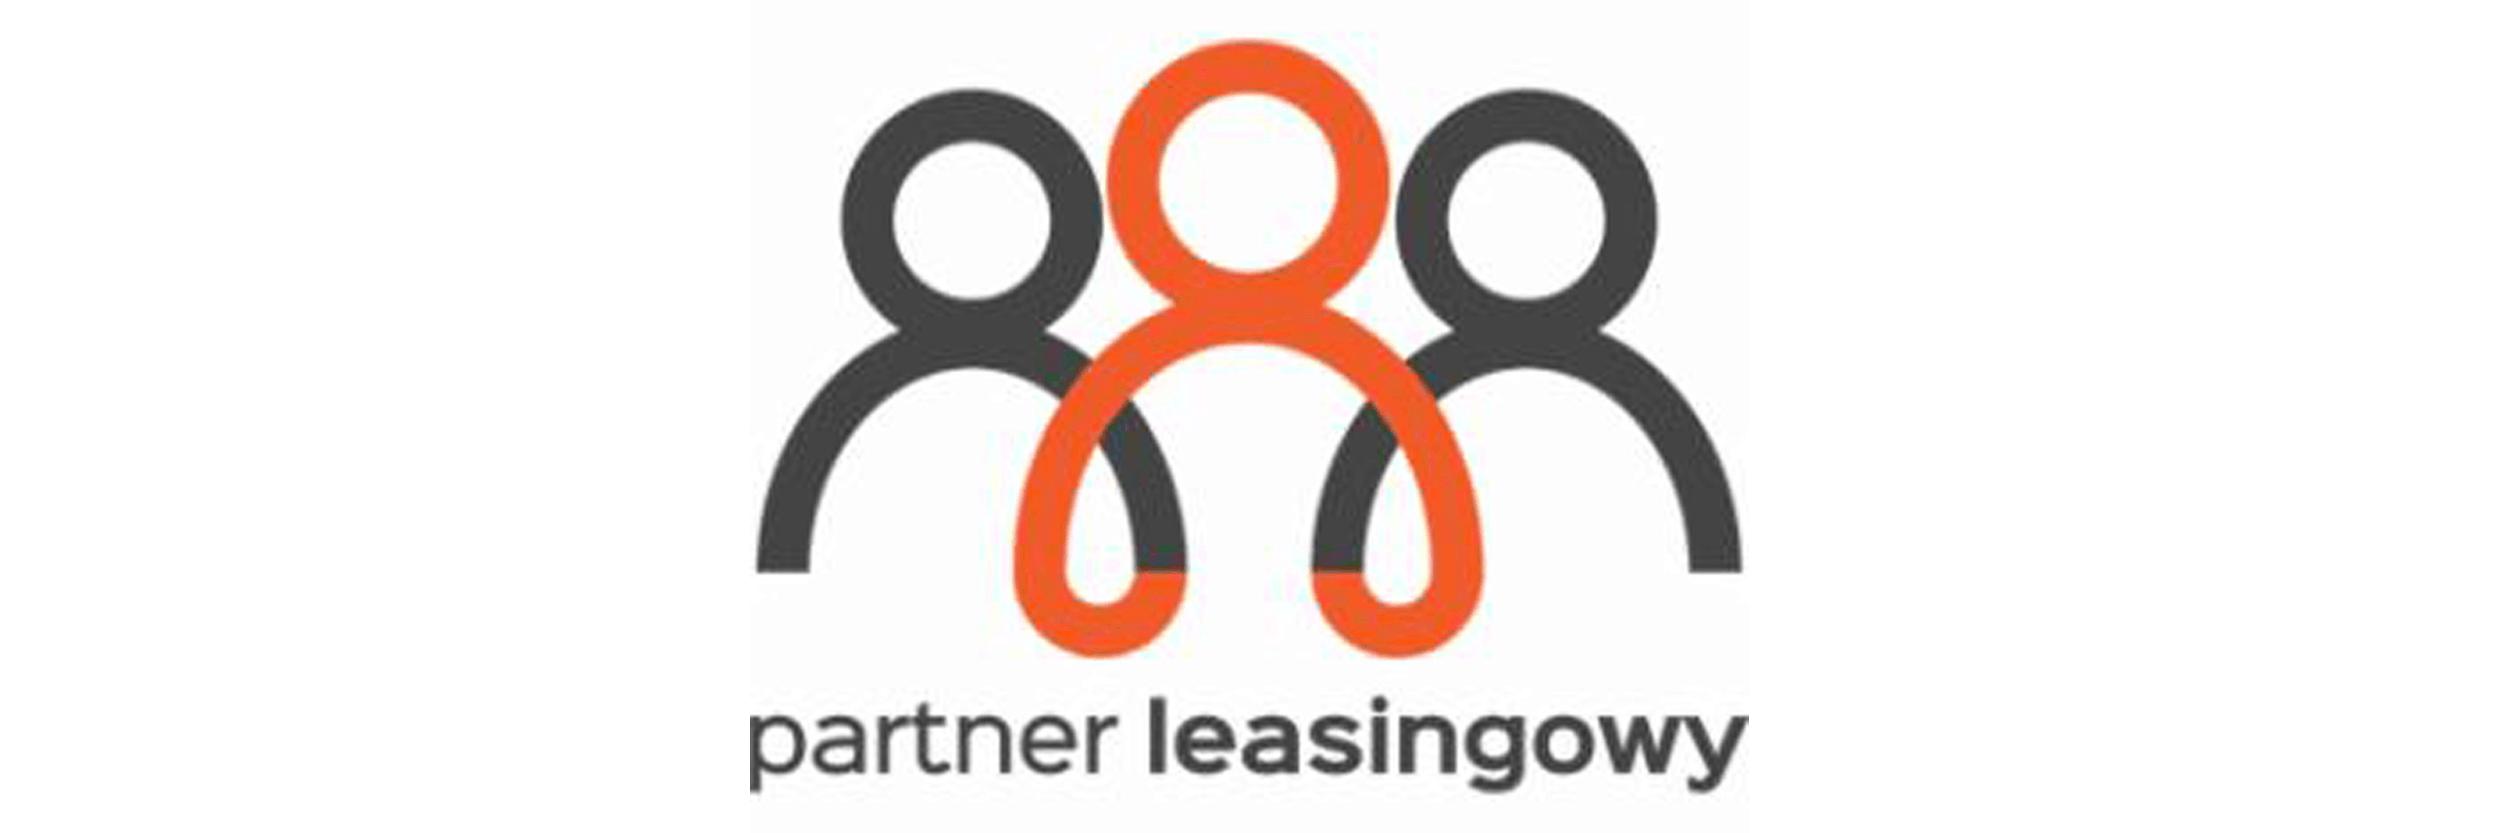 16_partnerleasingowy